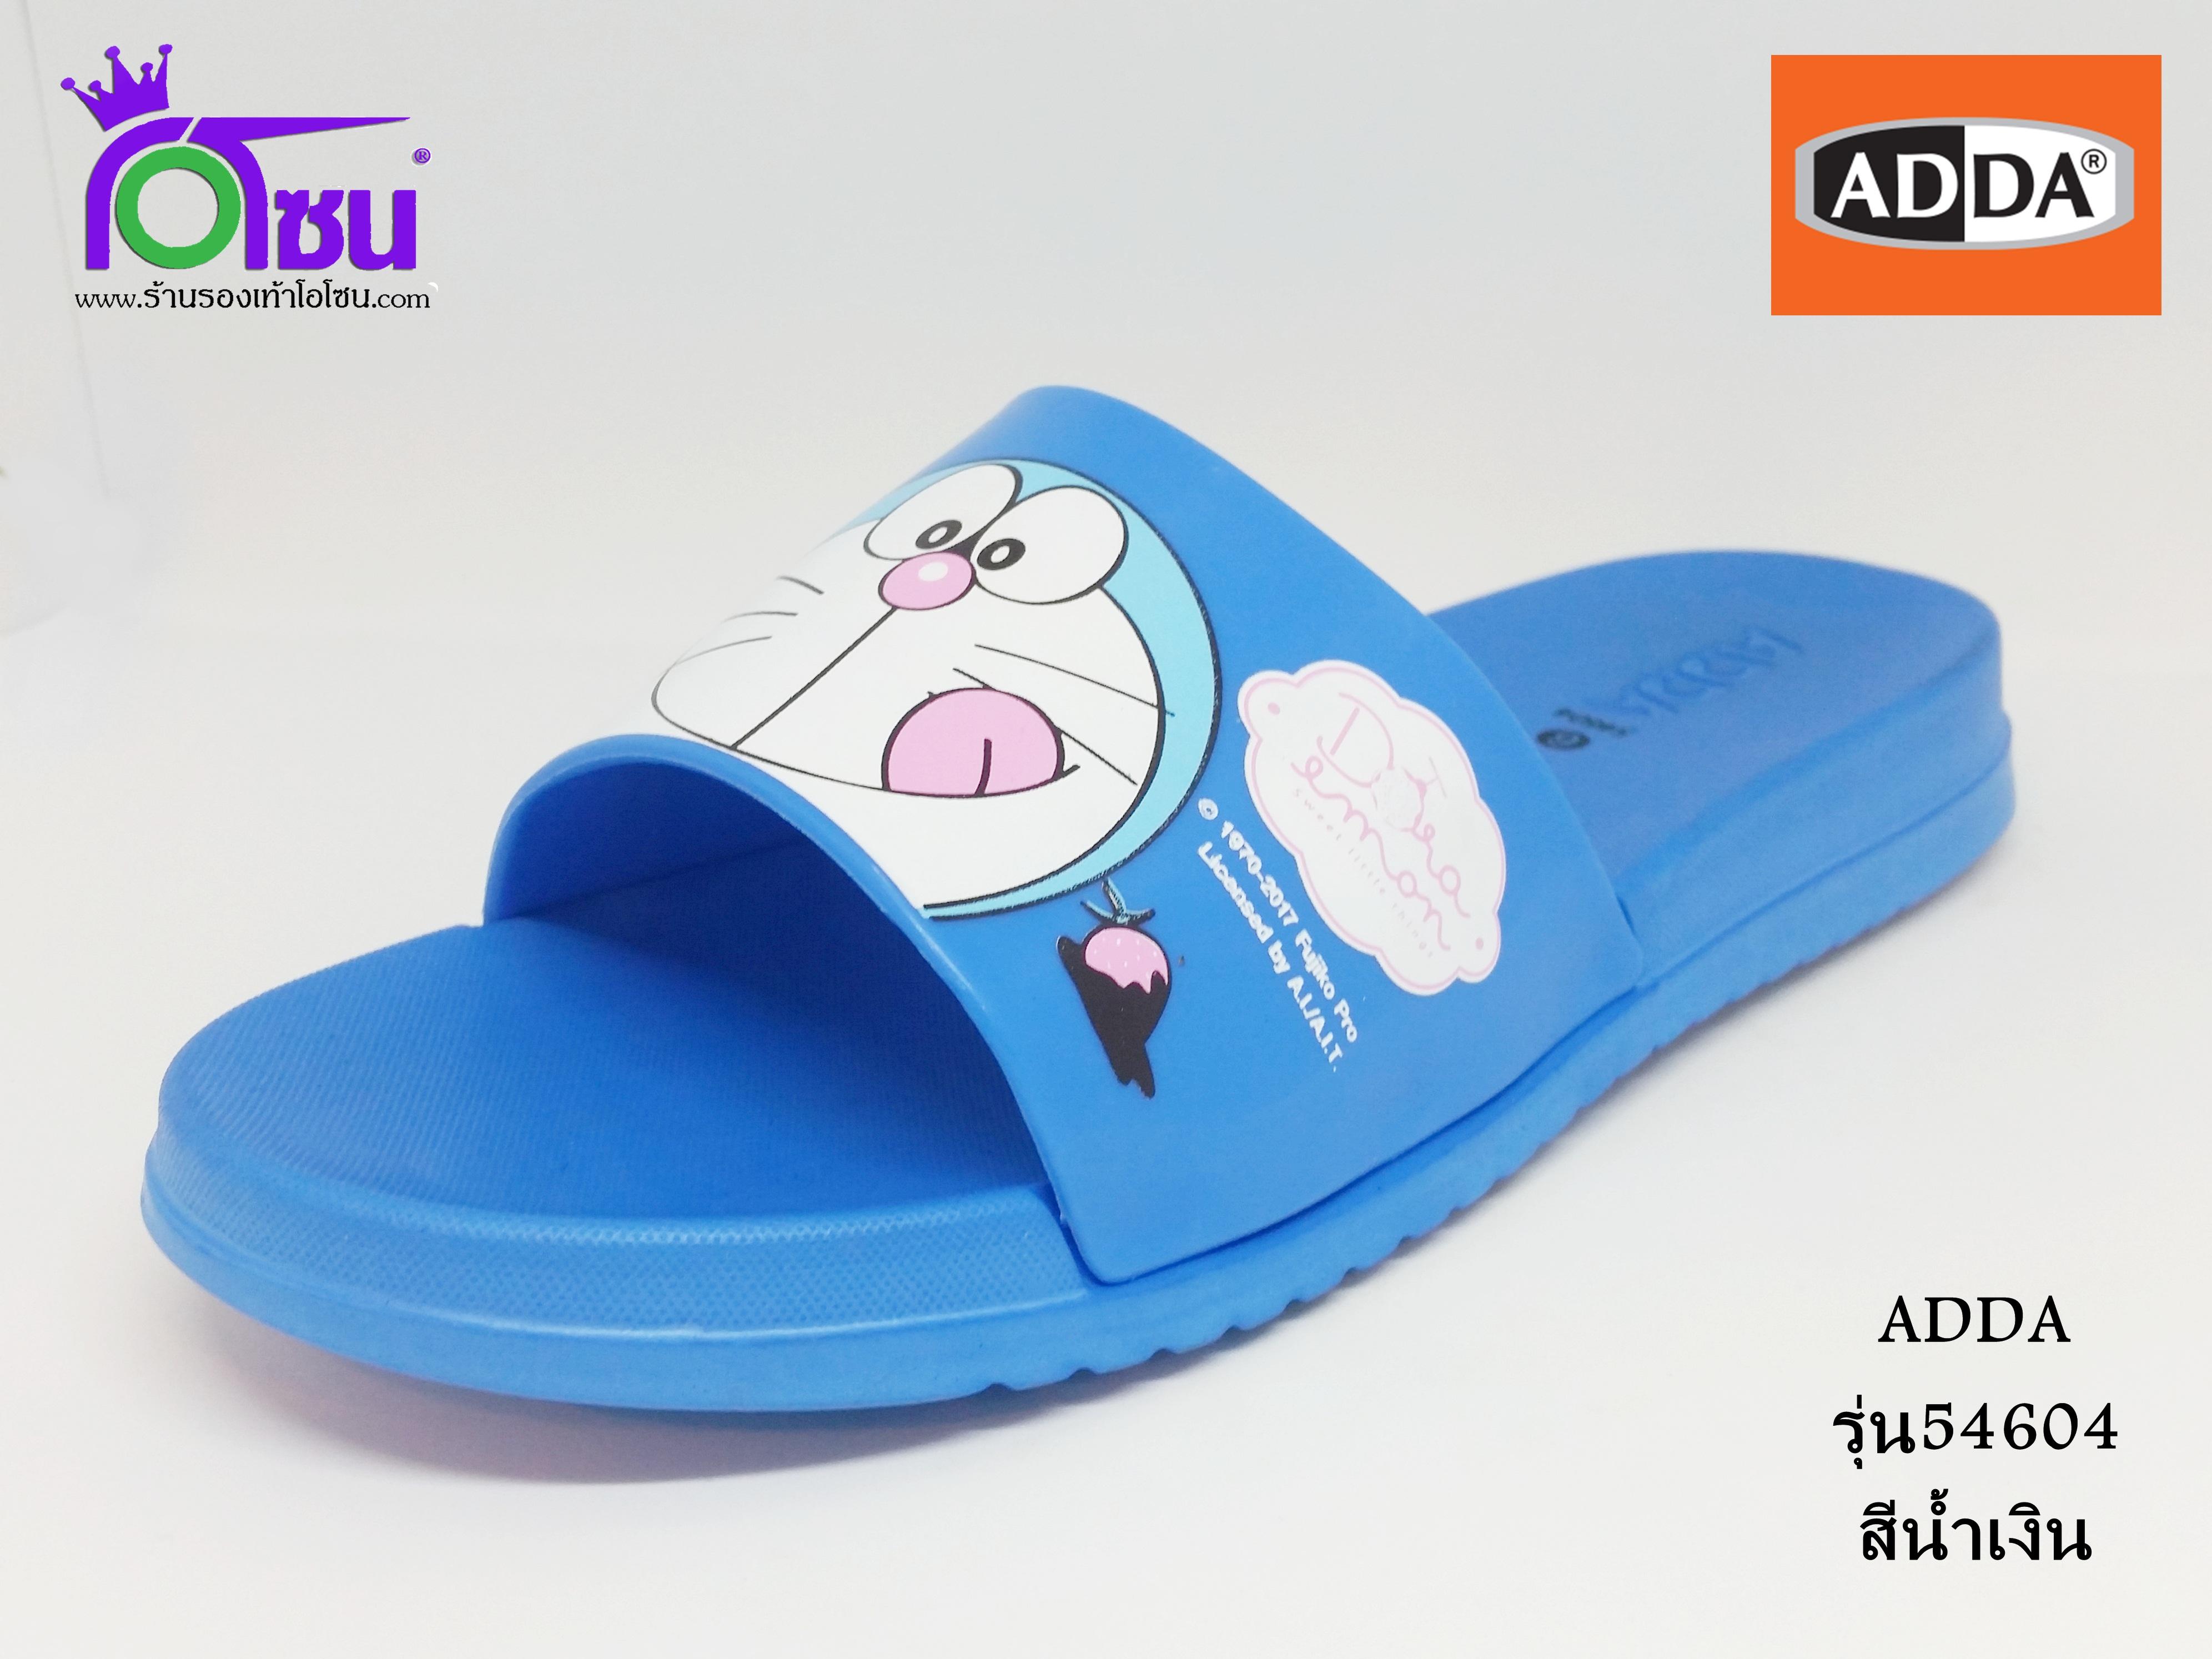 ADDA Doraemon แอ๊ดด้า โดราเอมอน รหัส 54604 สีน้ำเงิน เบอร์ 4-6